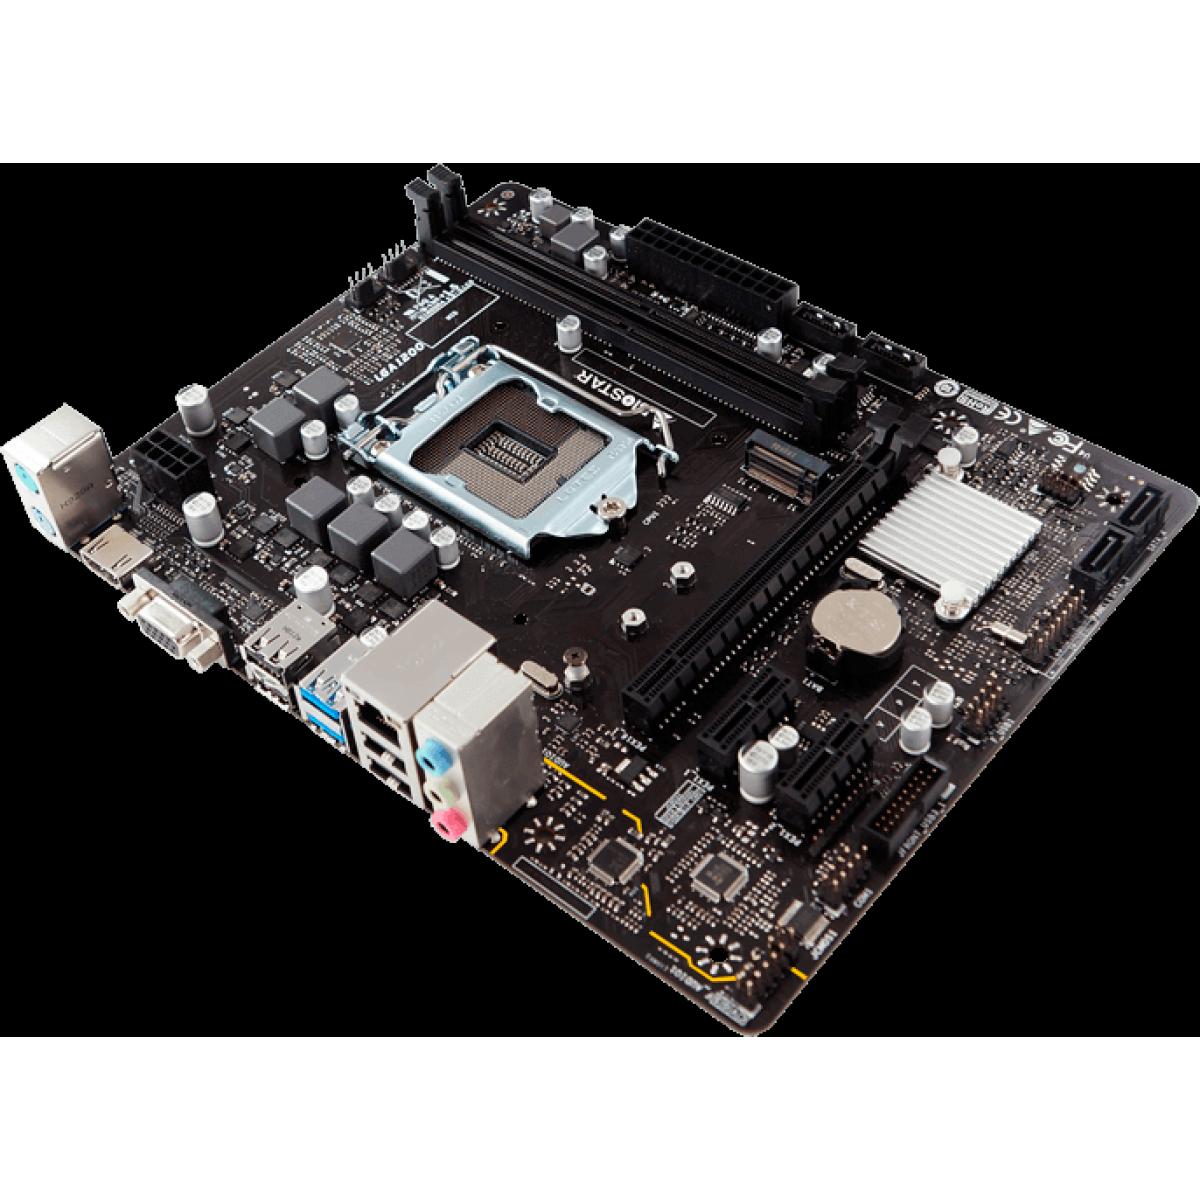 Placa Mãe Biostar H410MH VER 6.0, Chipset H410, Intel 1200, mATX, DDR4